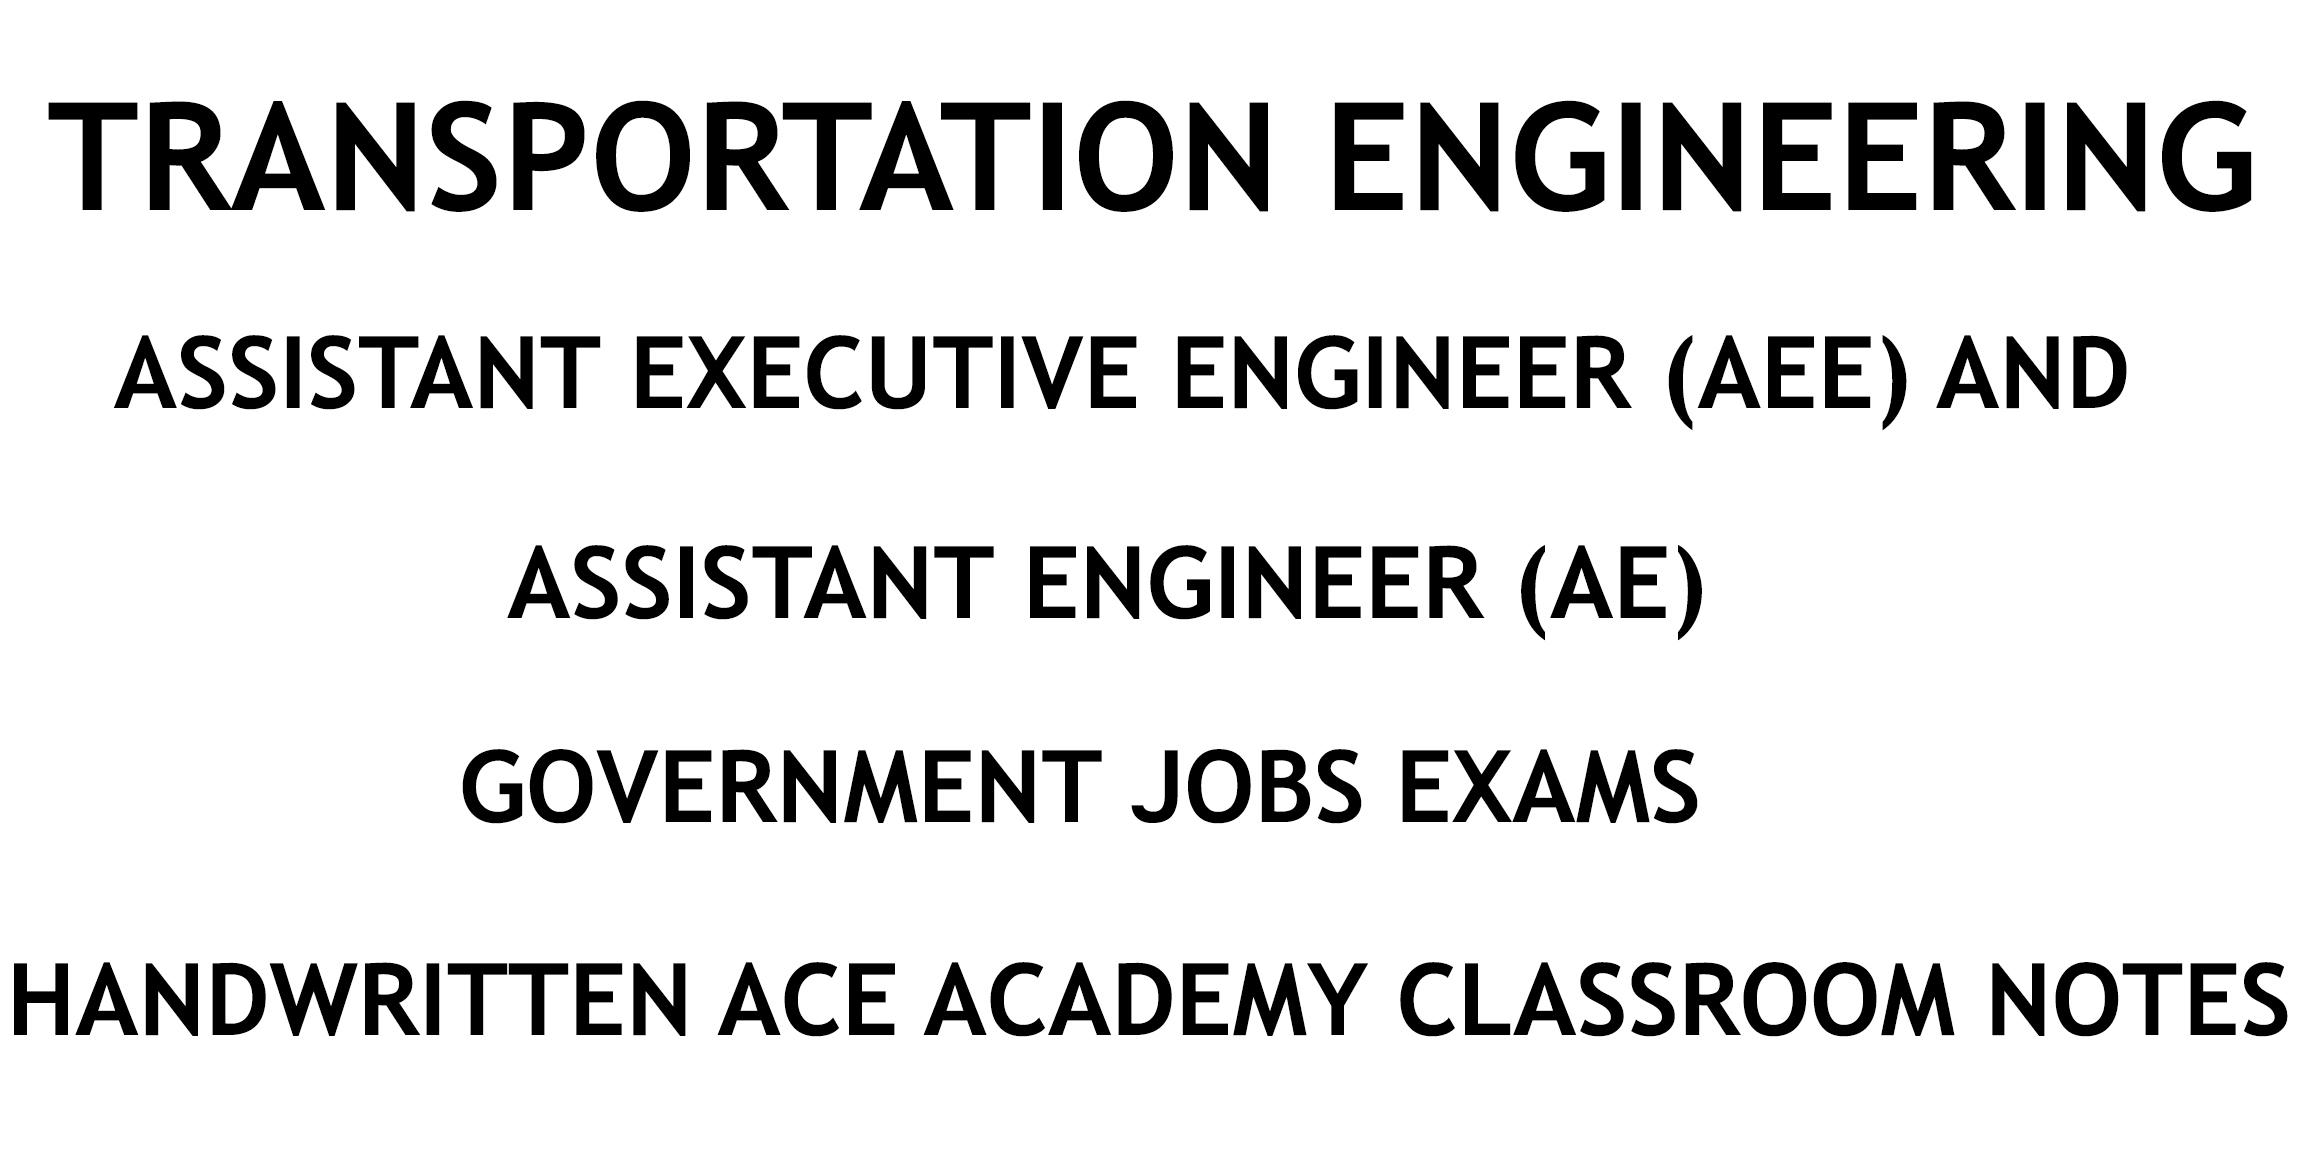 Transportation Engineering AE AEE Ace Academy Handwritten Notes PDF